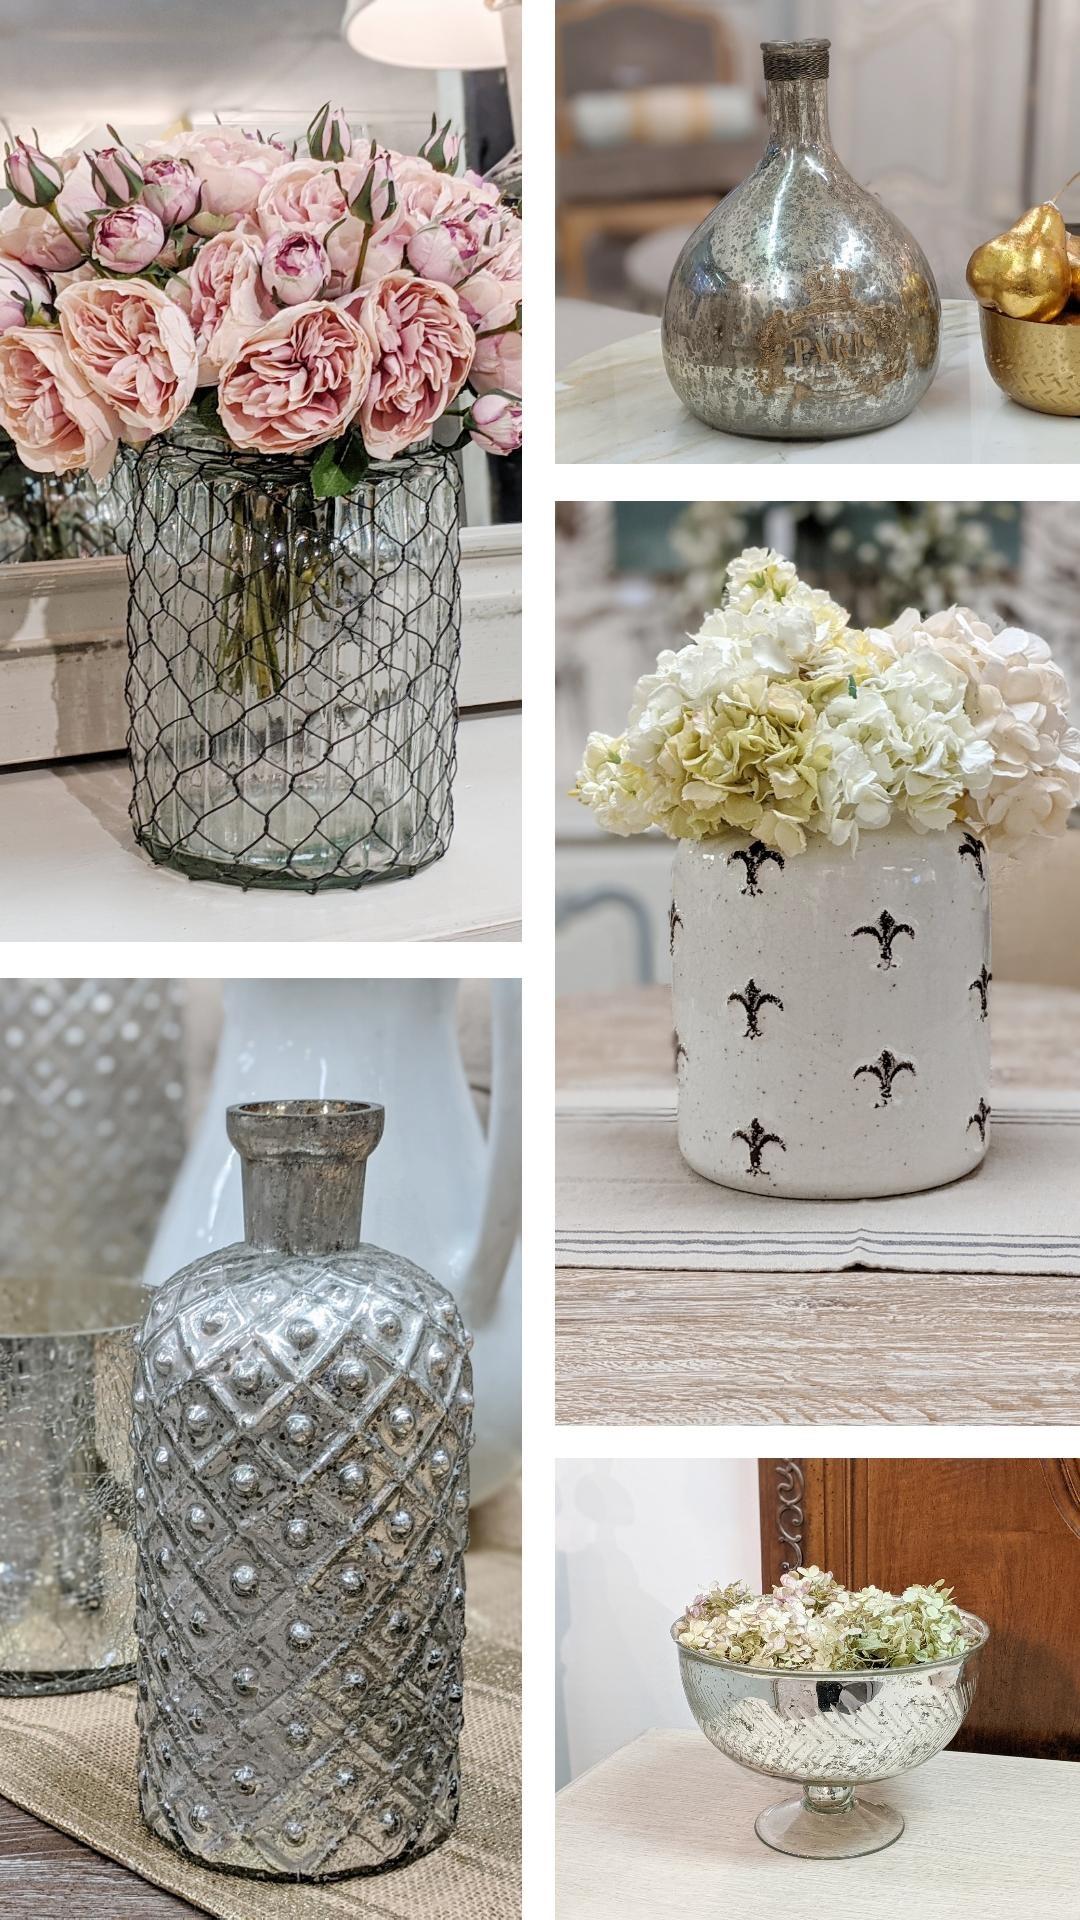 Examples of simple, elegant, floral arrangements for your farmhouse decor